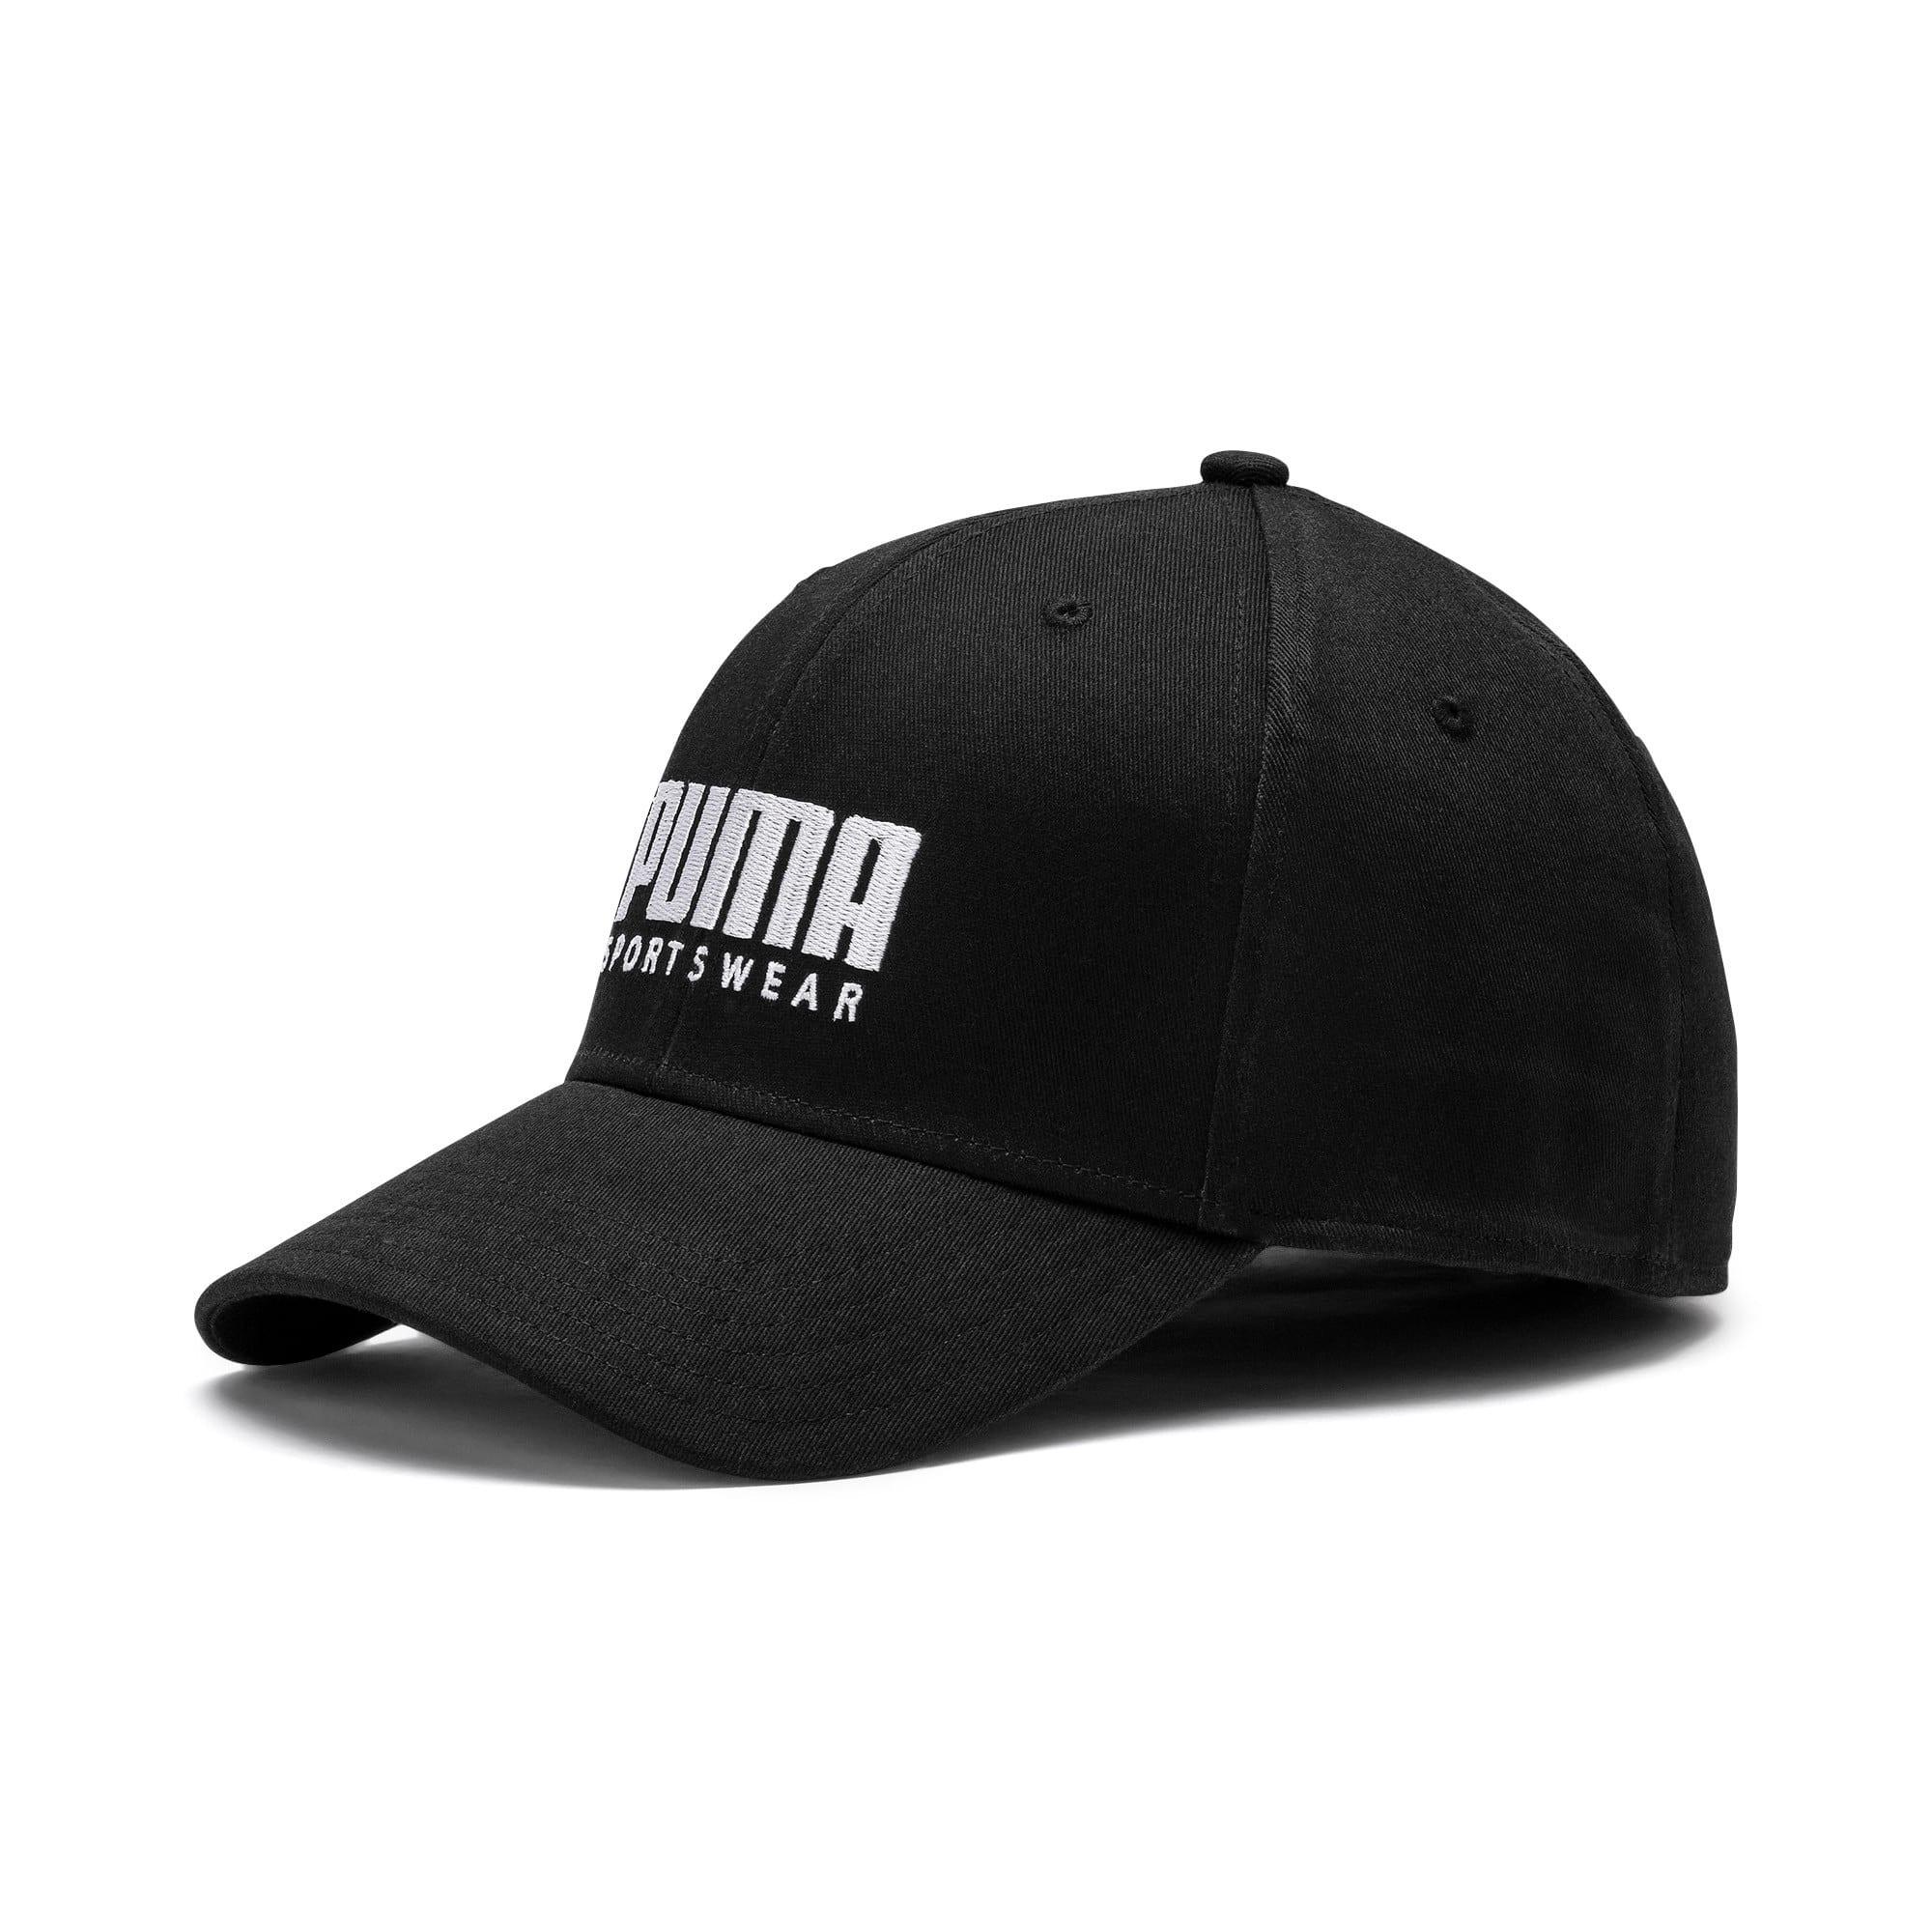 Thumbnail 1 of Stretchfit Baseball Cap, Puma Black, medium